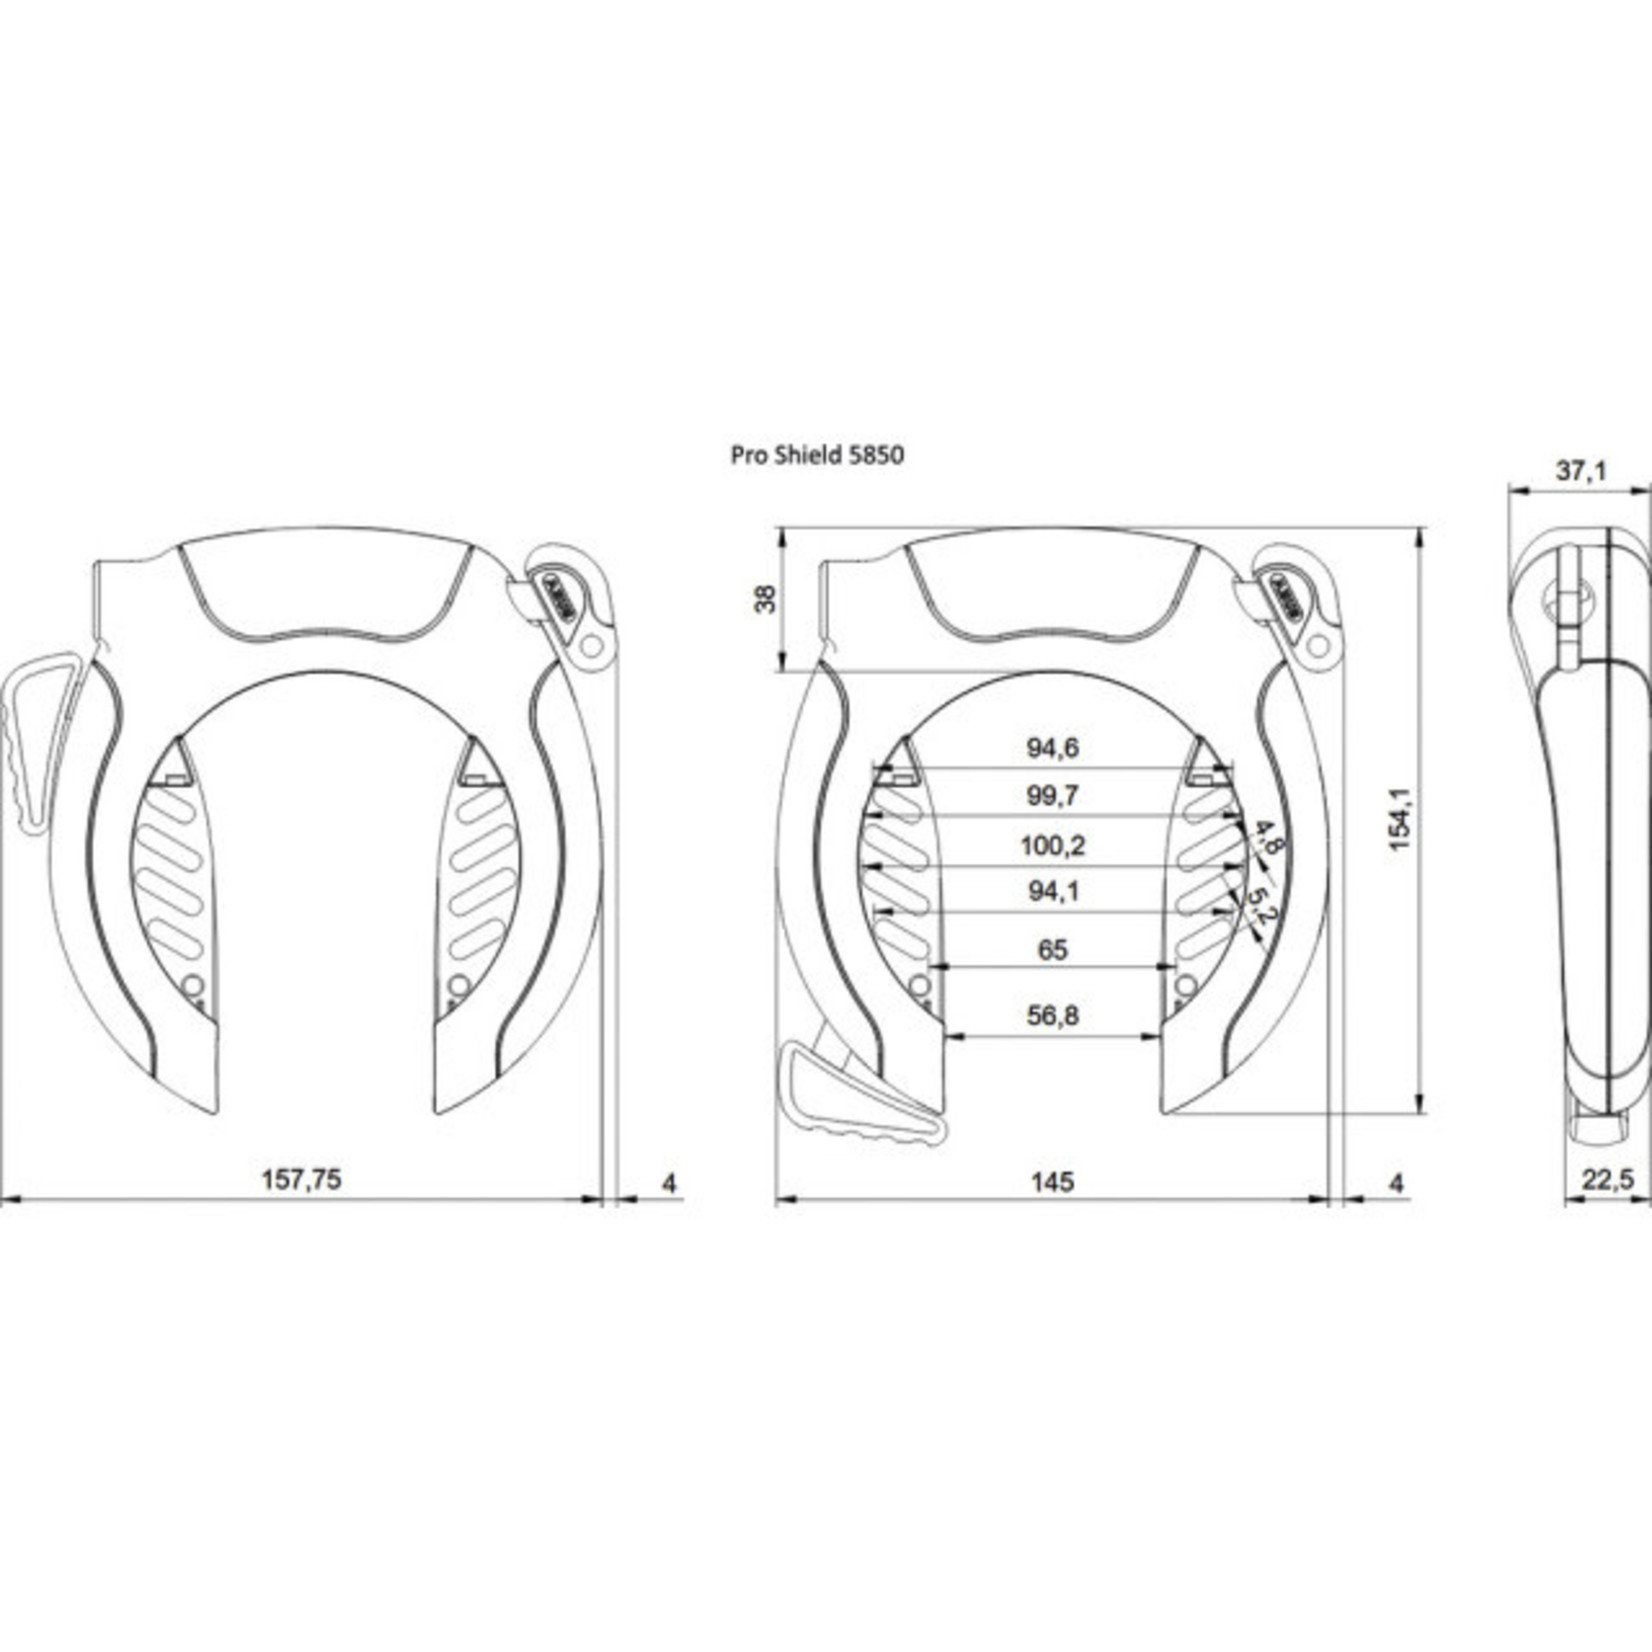 ABUS ABUS - Rahmenschloss Pro Shield 5850